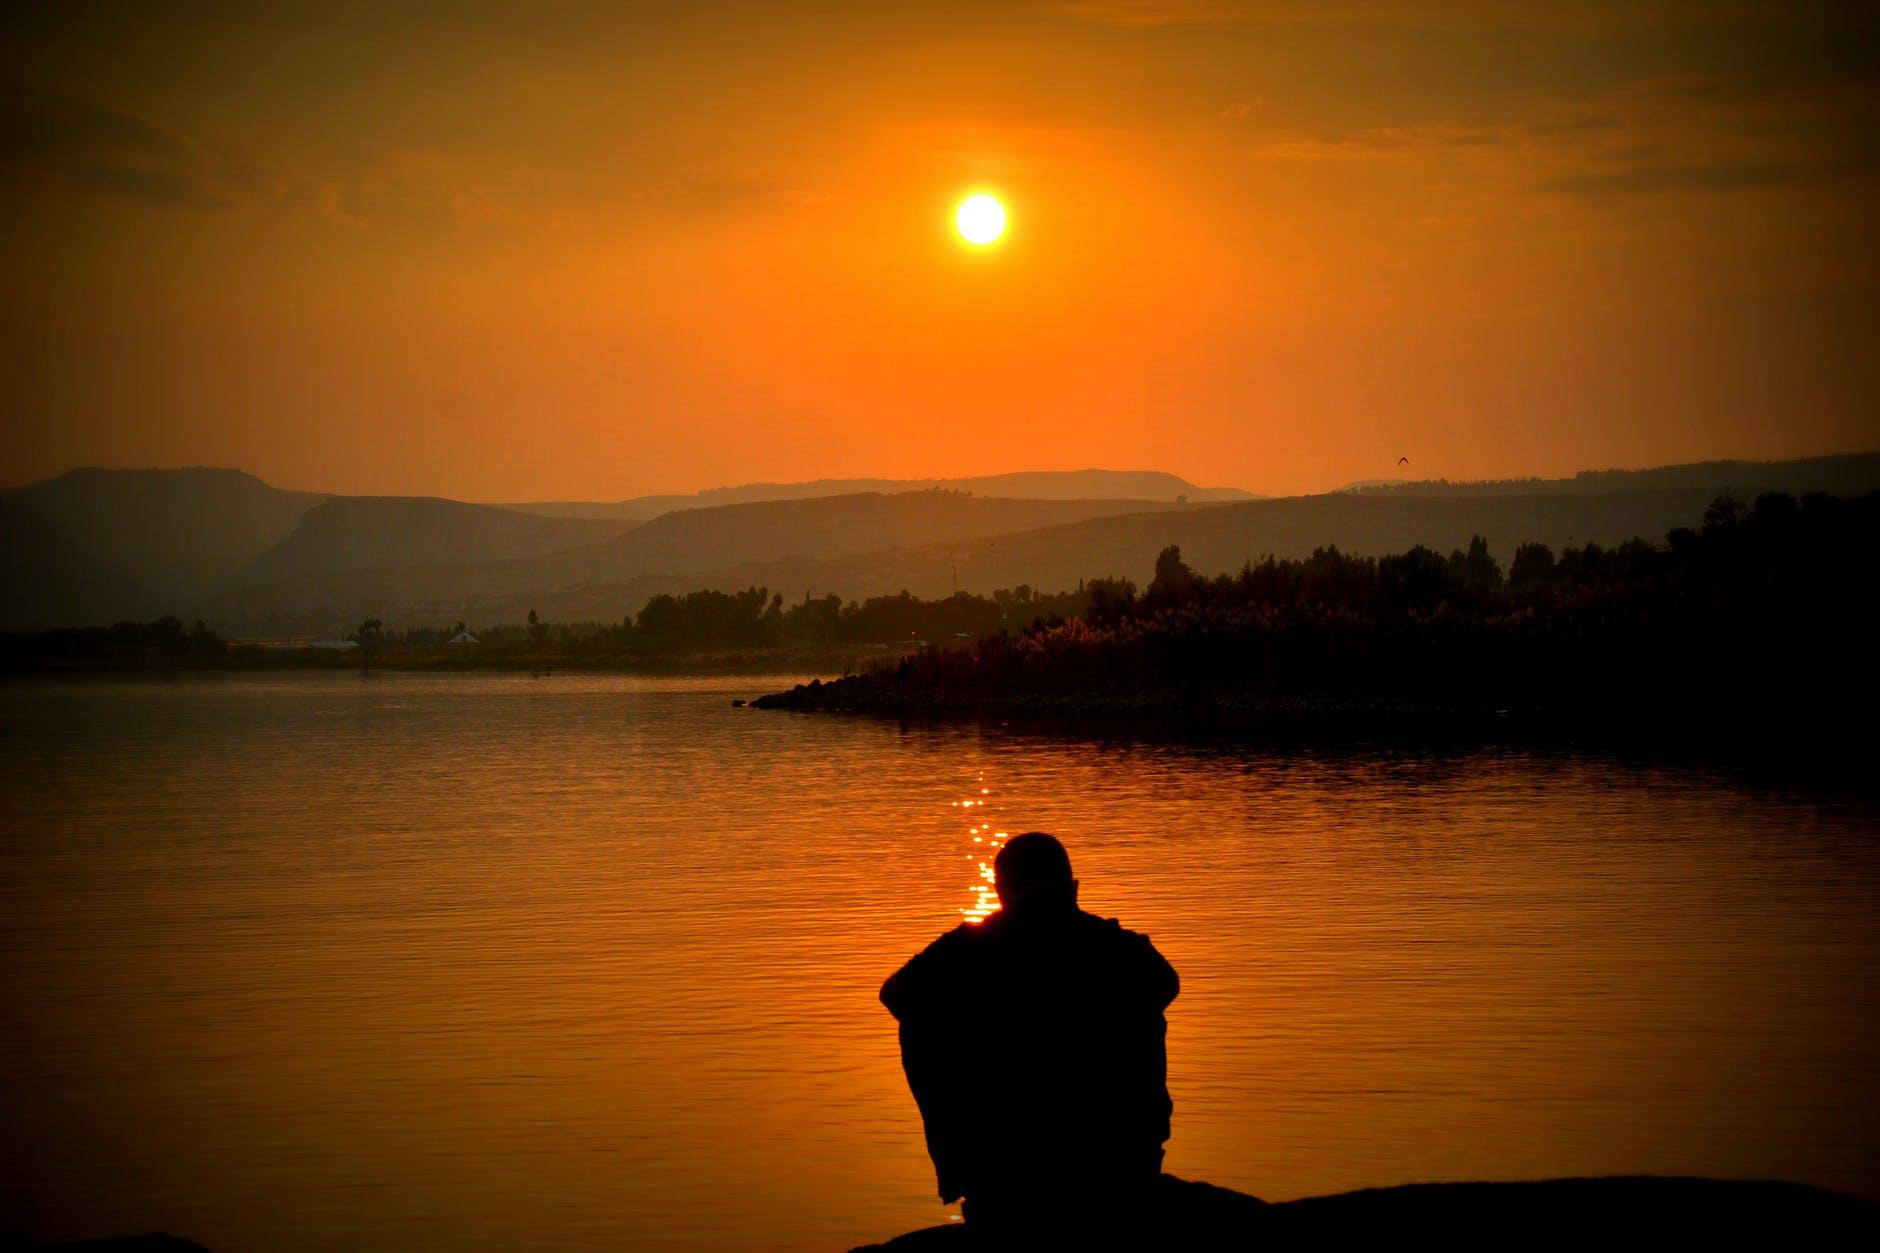 sunset love lake resort